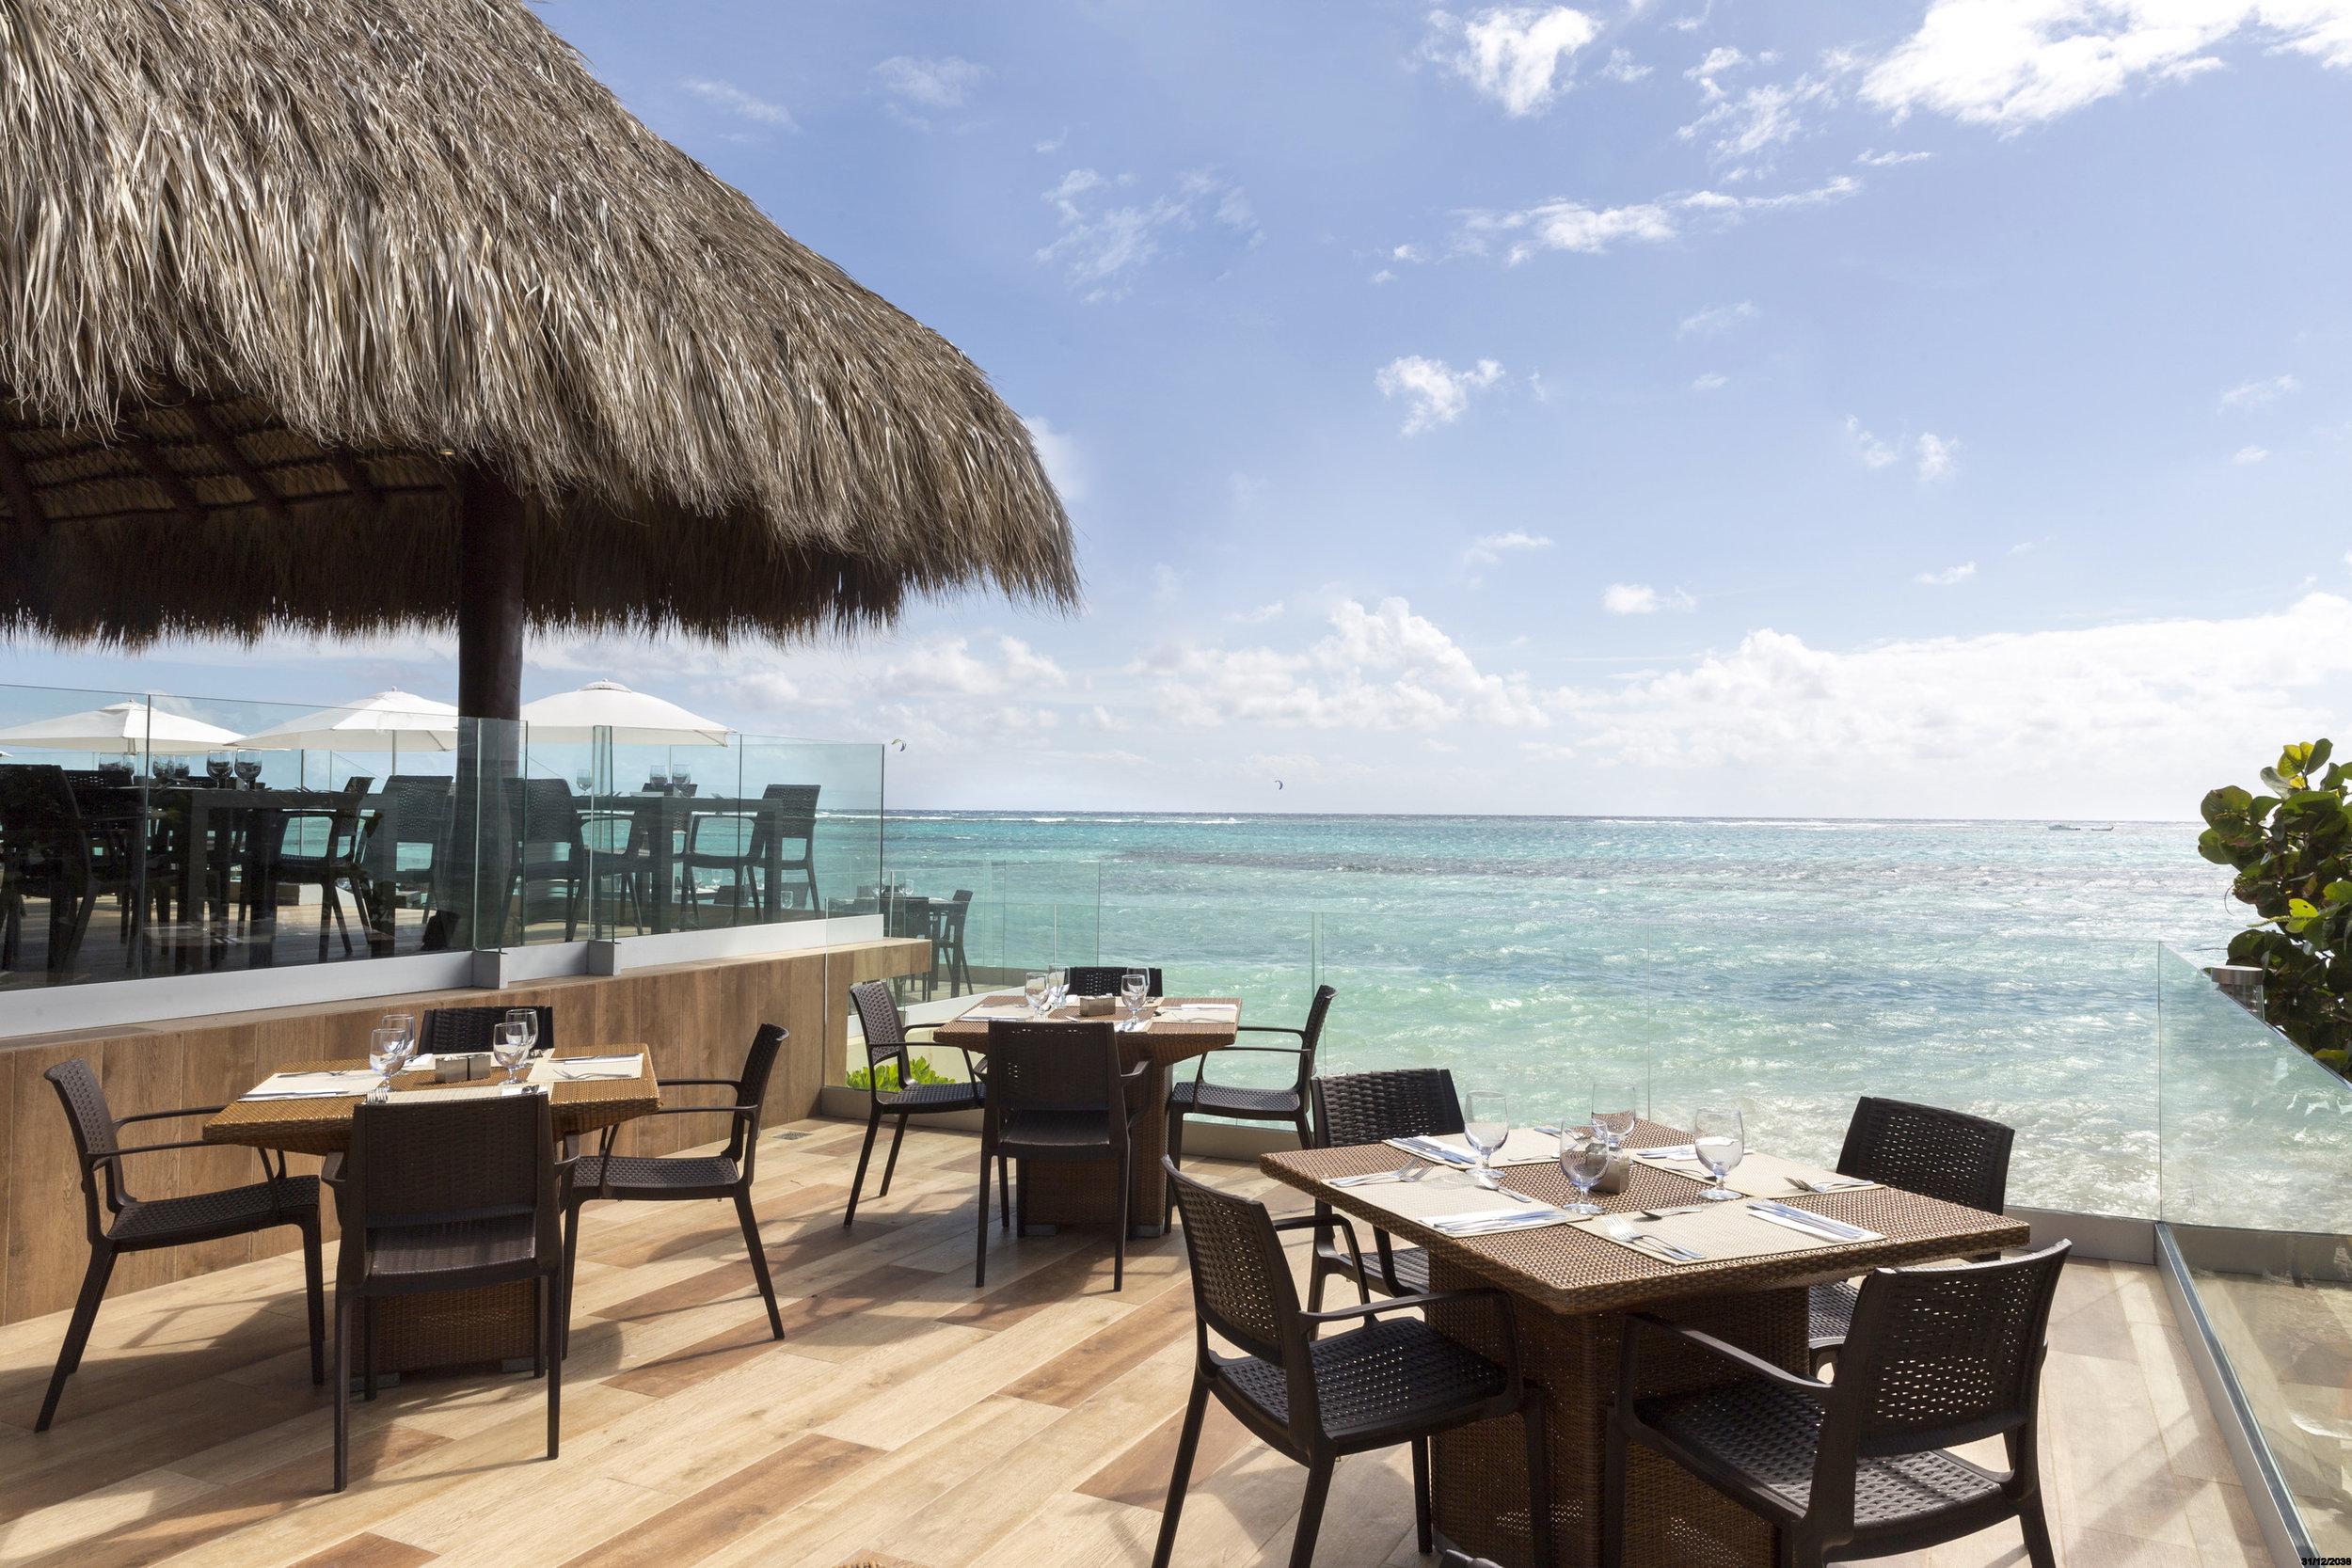 Club Med Punta Cana Crédit photo : Club Med